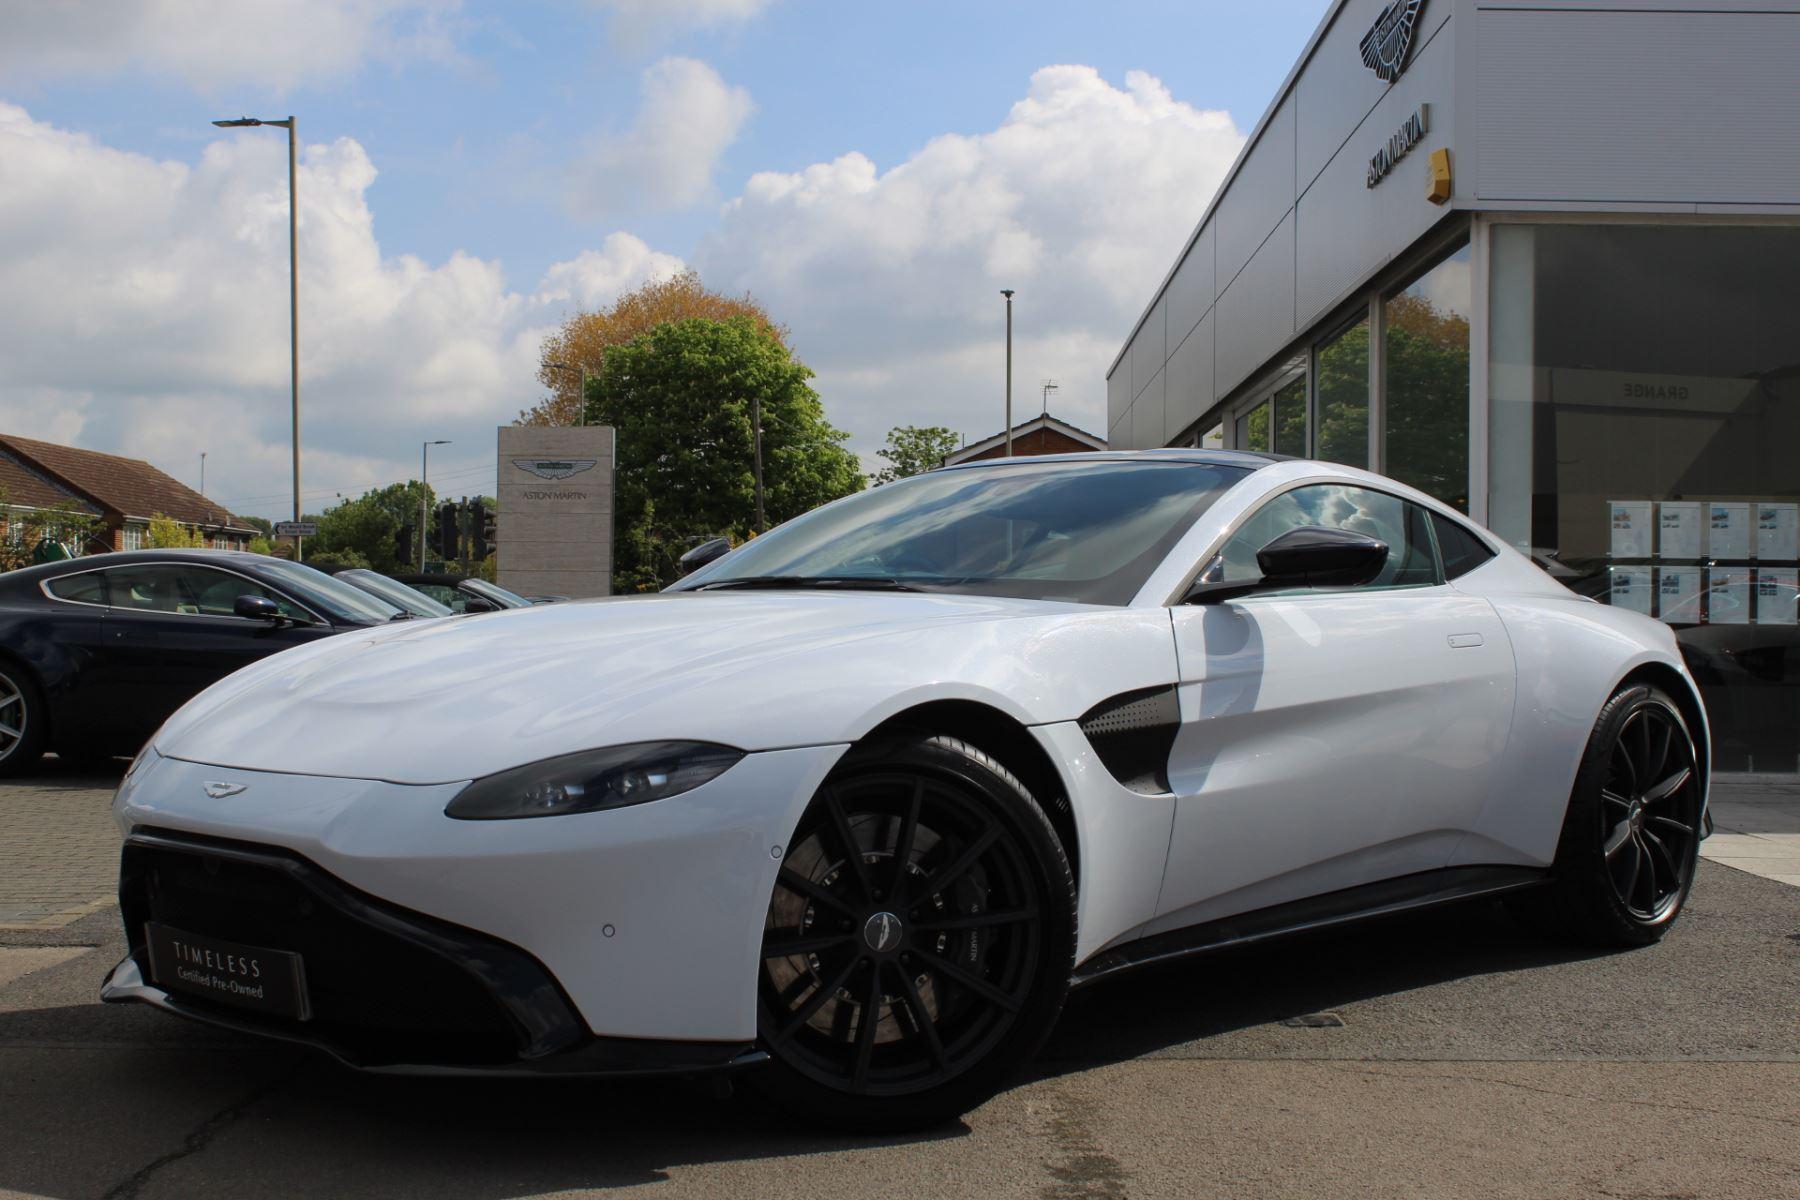 Aston Martin New Vantage Coupe 4.0 Automatic 2 door (2019) image